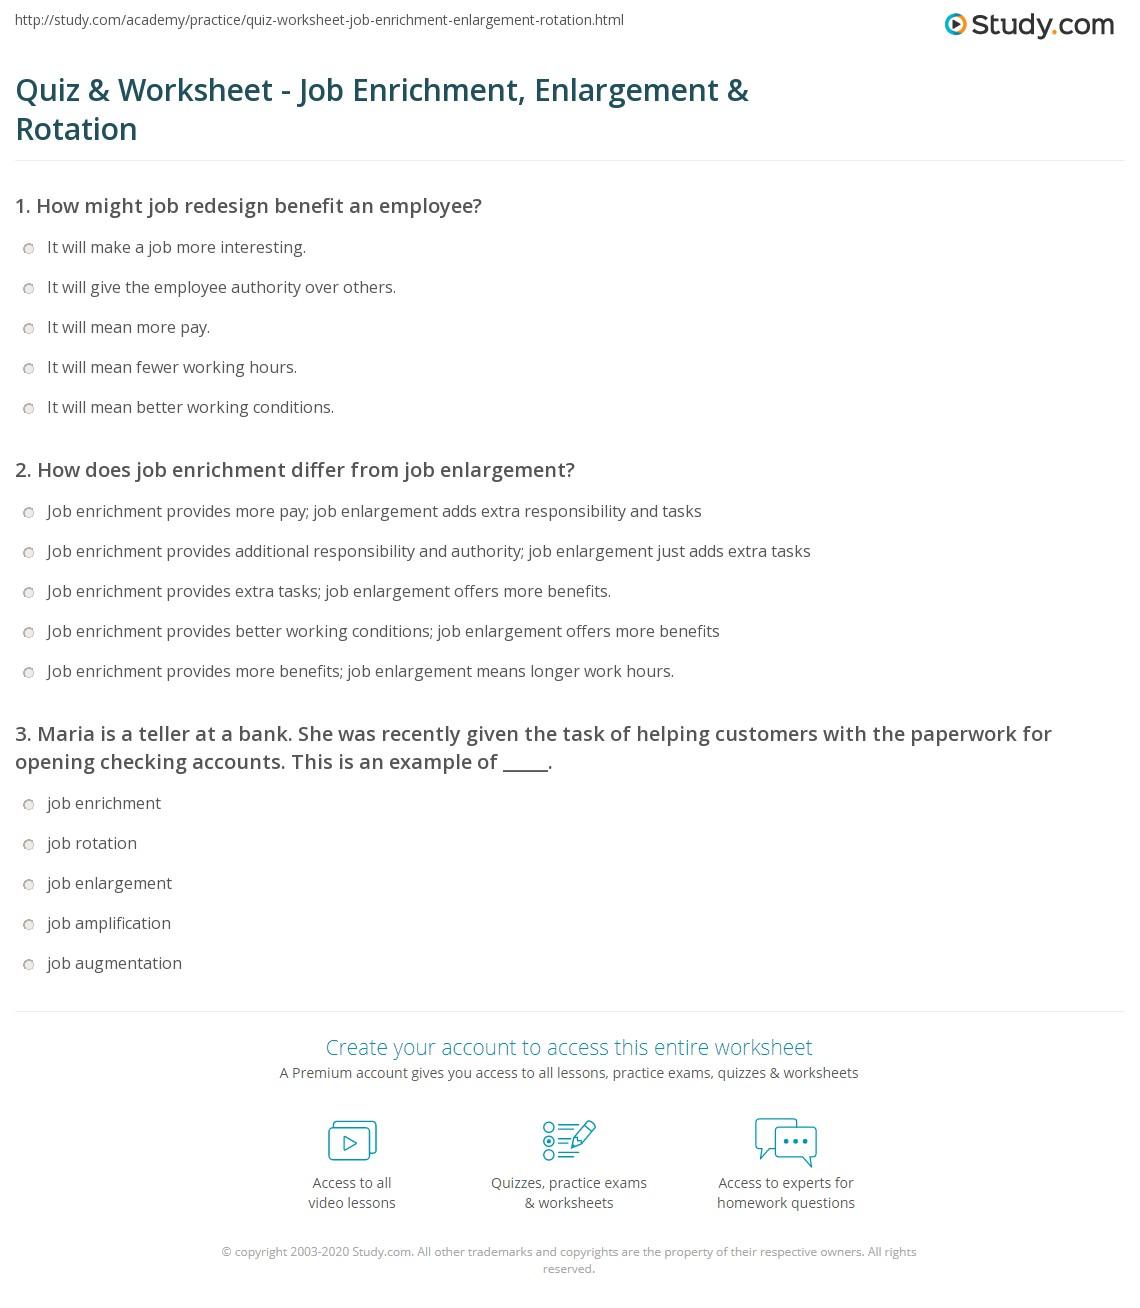 quiz worksheet job enrichment enlargement rotation com print types of job redesign job enrichment enlargement rotation worksheet